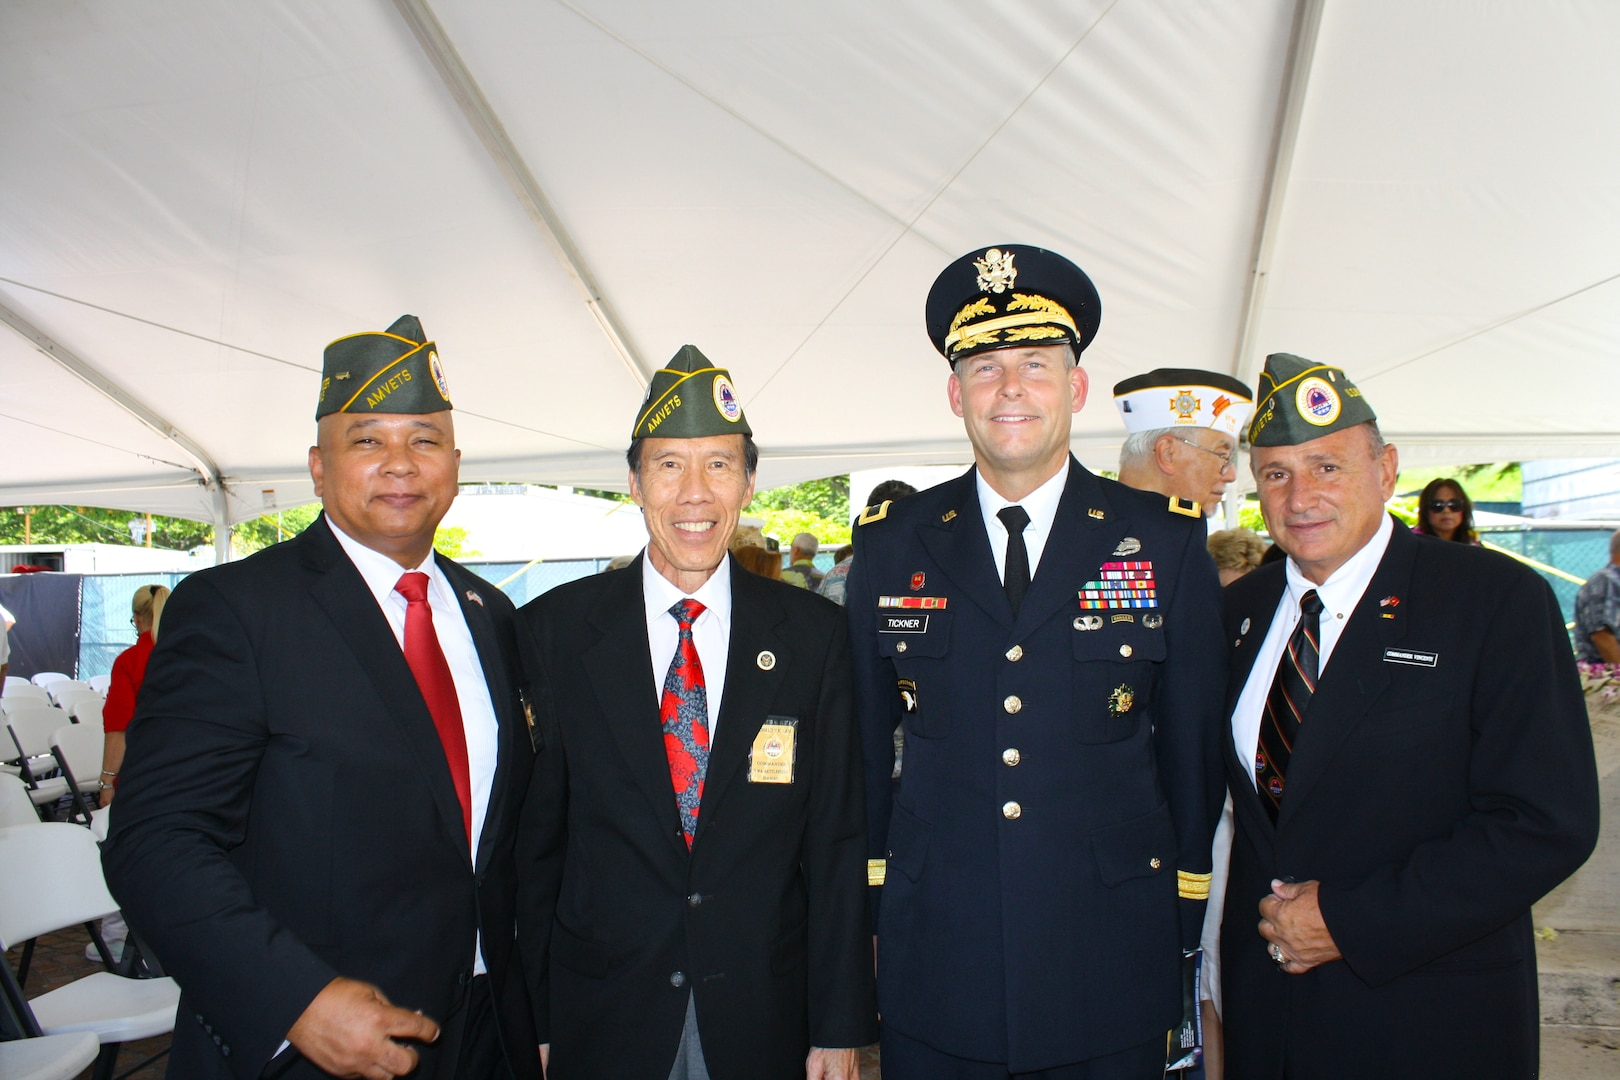 USACE Pacific Ocean Division Commanding General honors POWs during memorial stone dedication